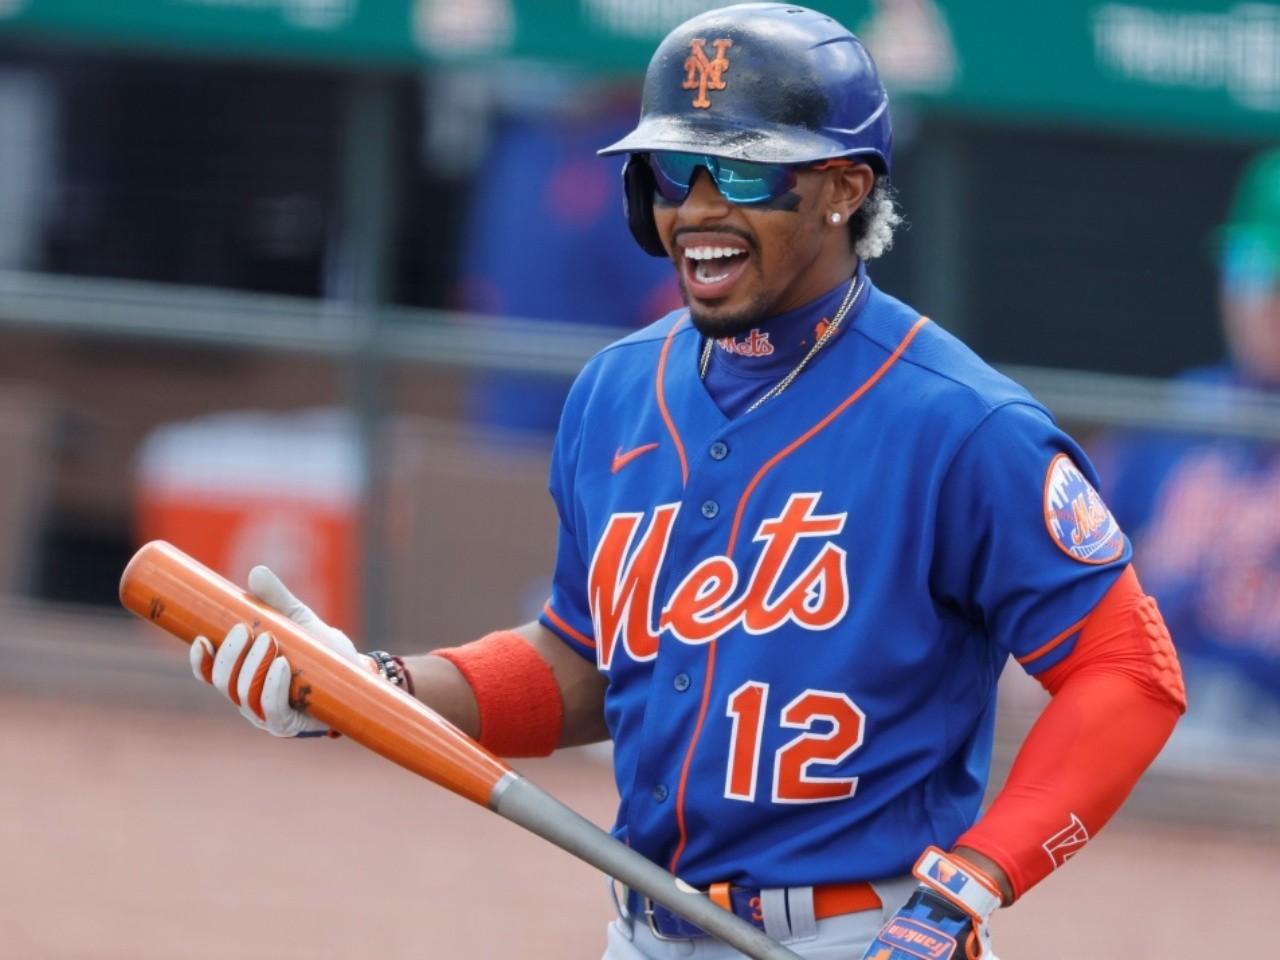 El topic de Baseball Mlb_francisco_lindor_new_york_mets_yankees.jpg_1187729725